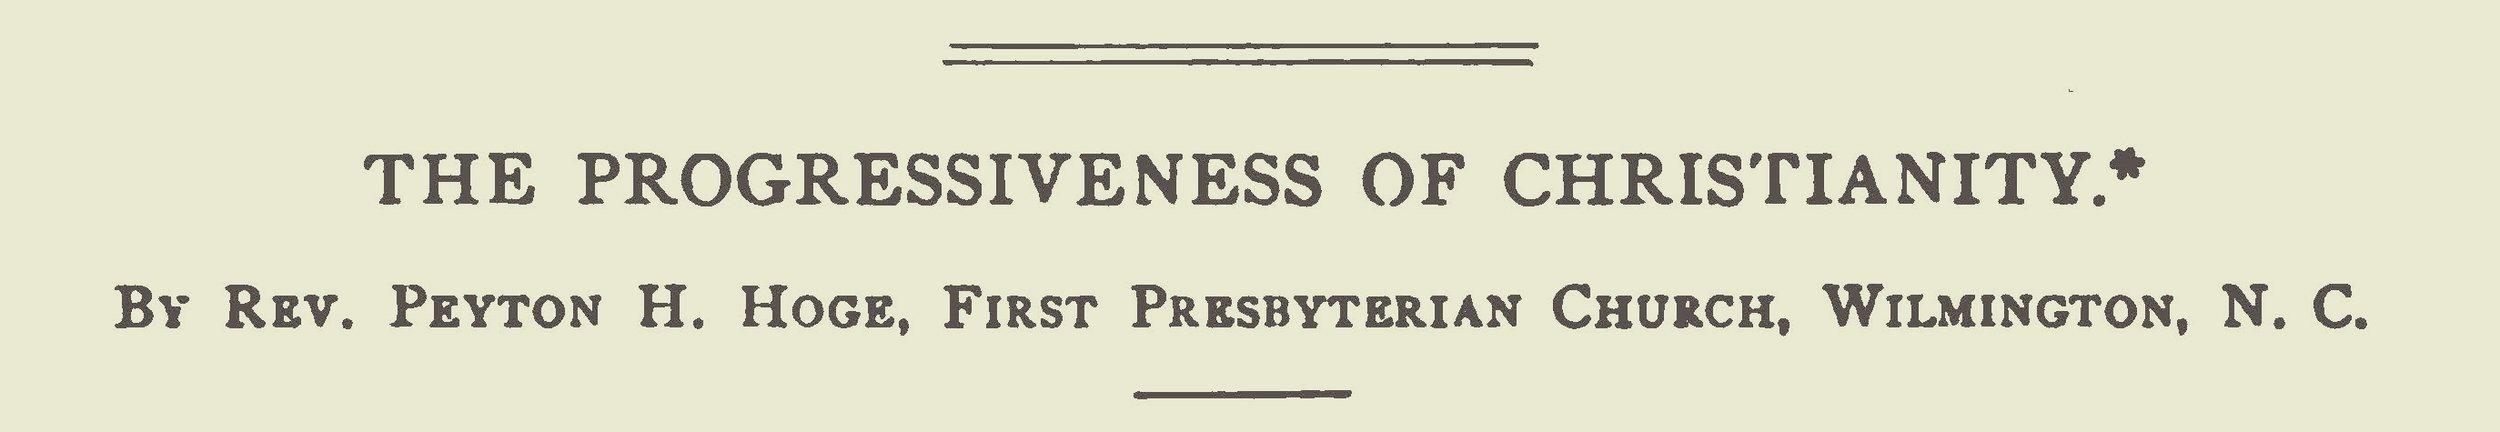 Hoge, Peyton Harrison, The Progressiveness of Christianity Title Page.jpg